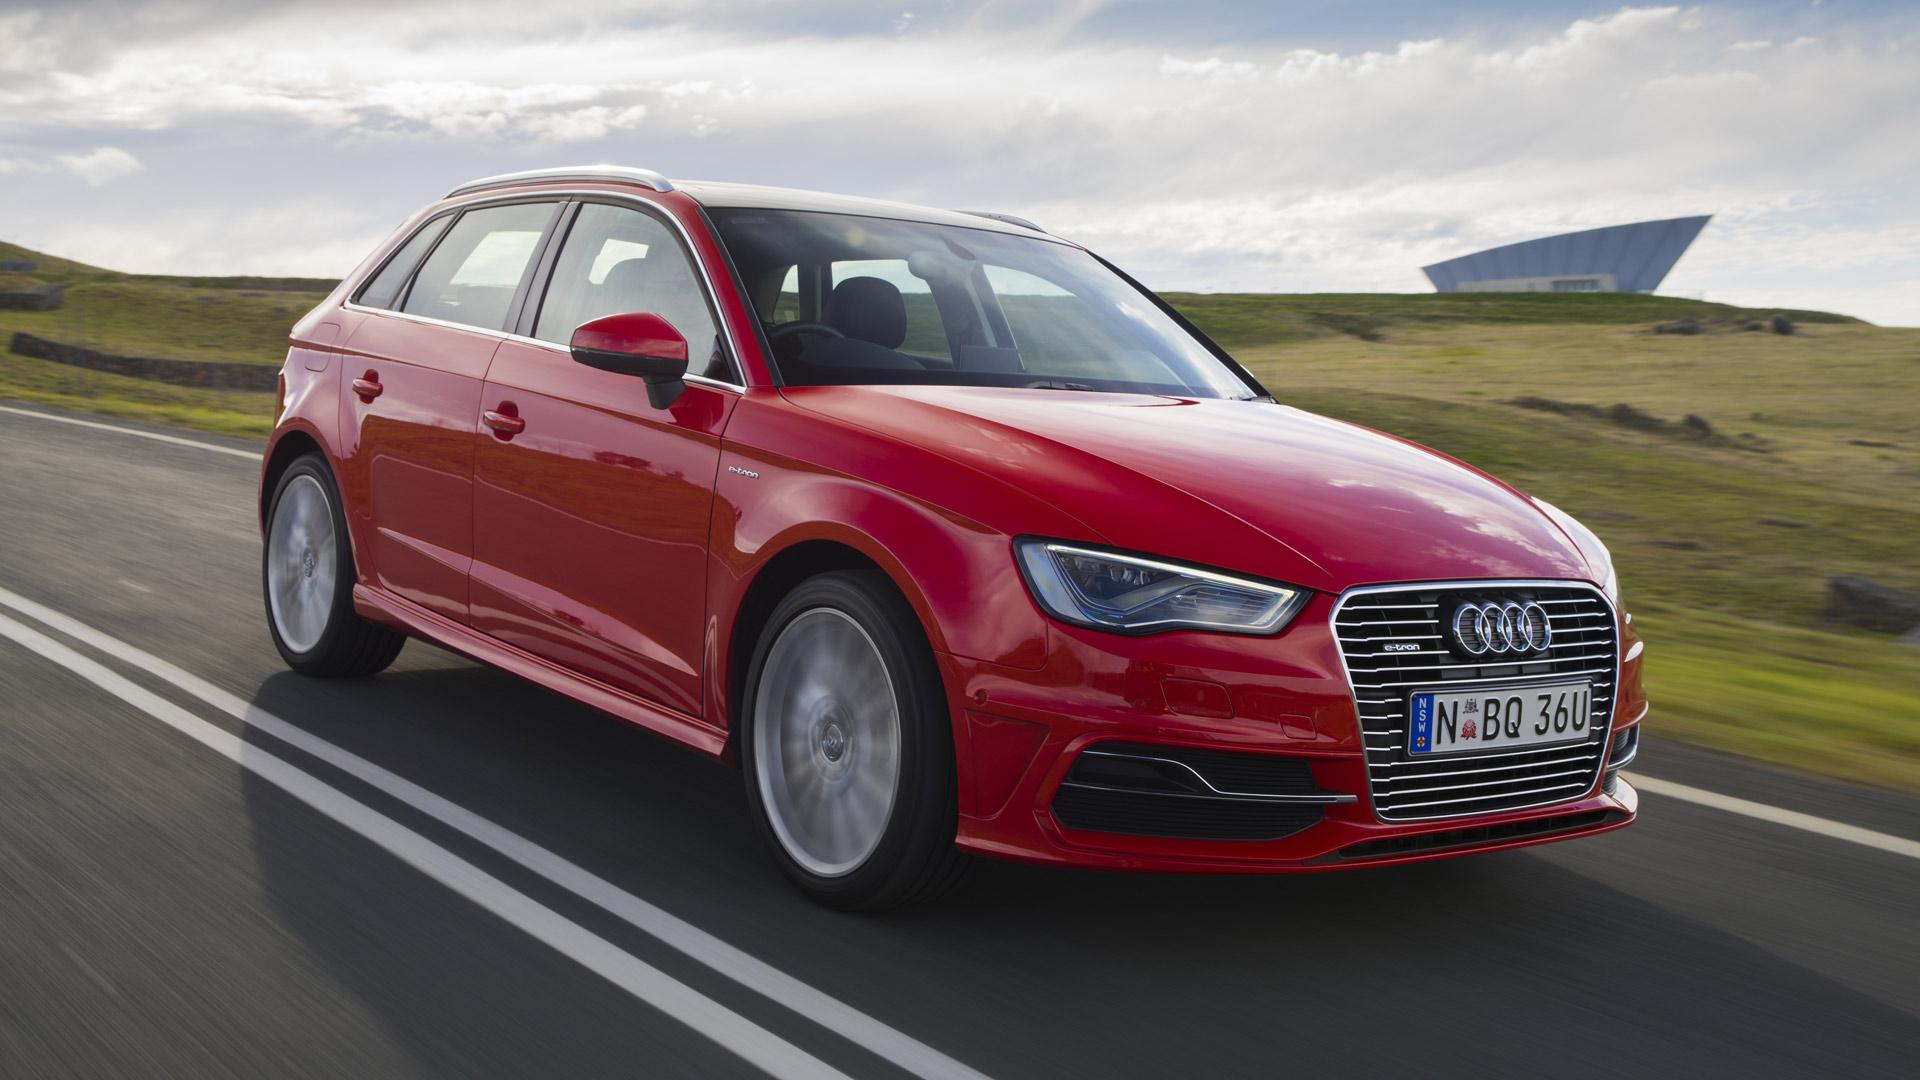 Origin Partners With Audi For A Launch Of Electric Vehicle - Audi car origin